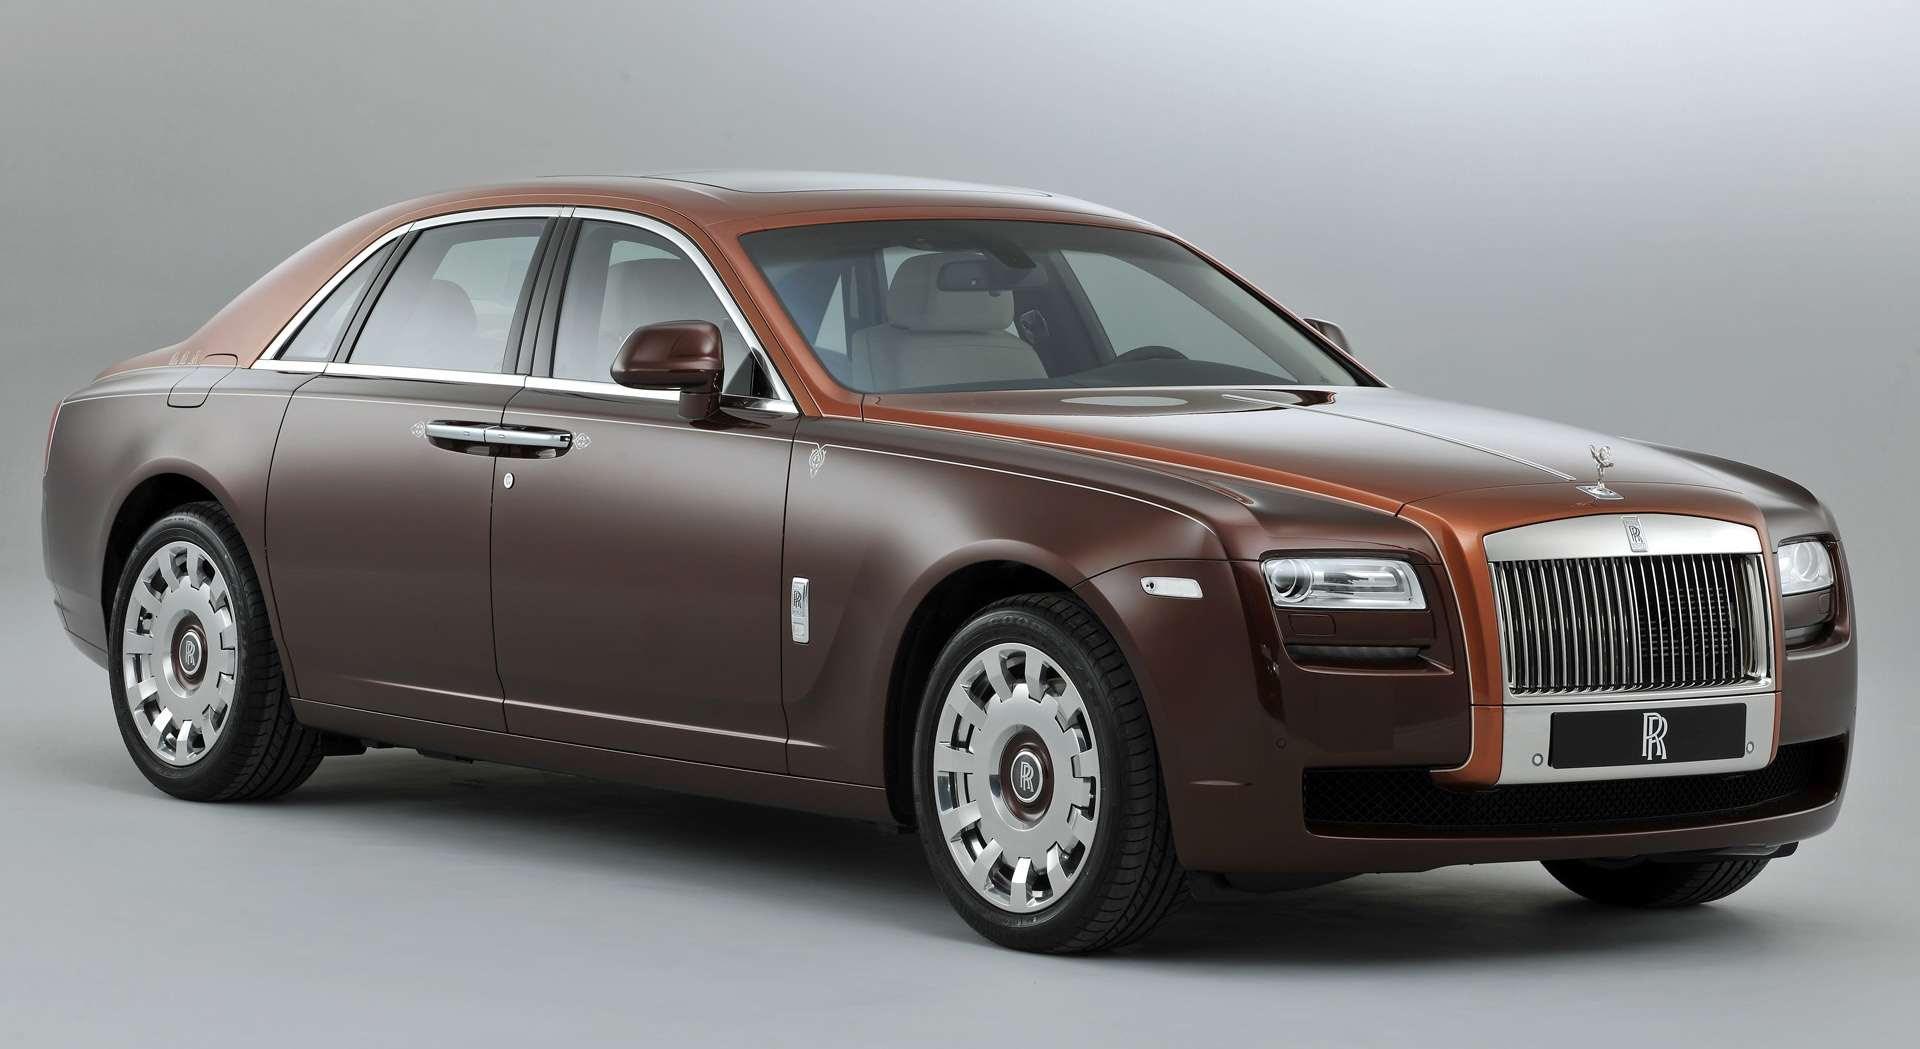 2015 Rolls Royce Phantom Widescreen Photos